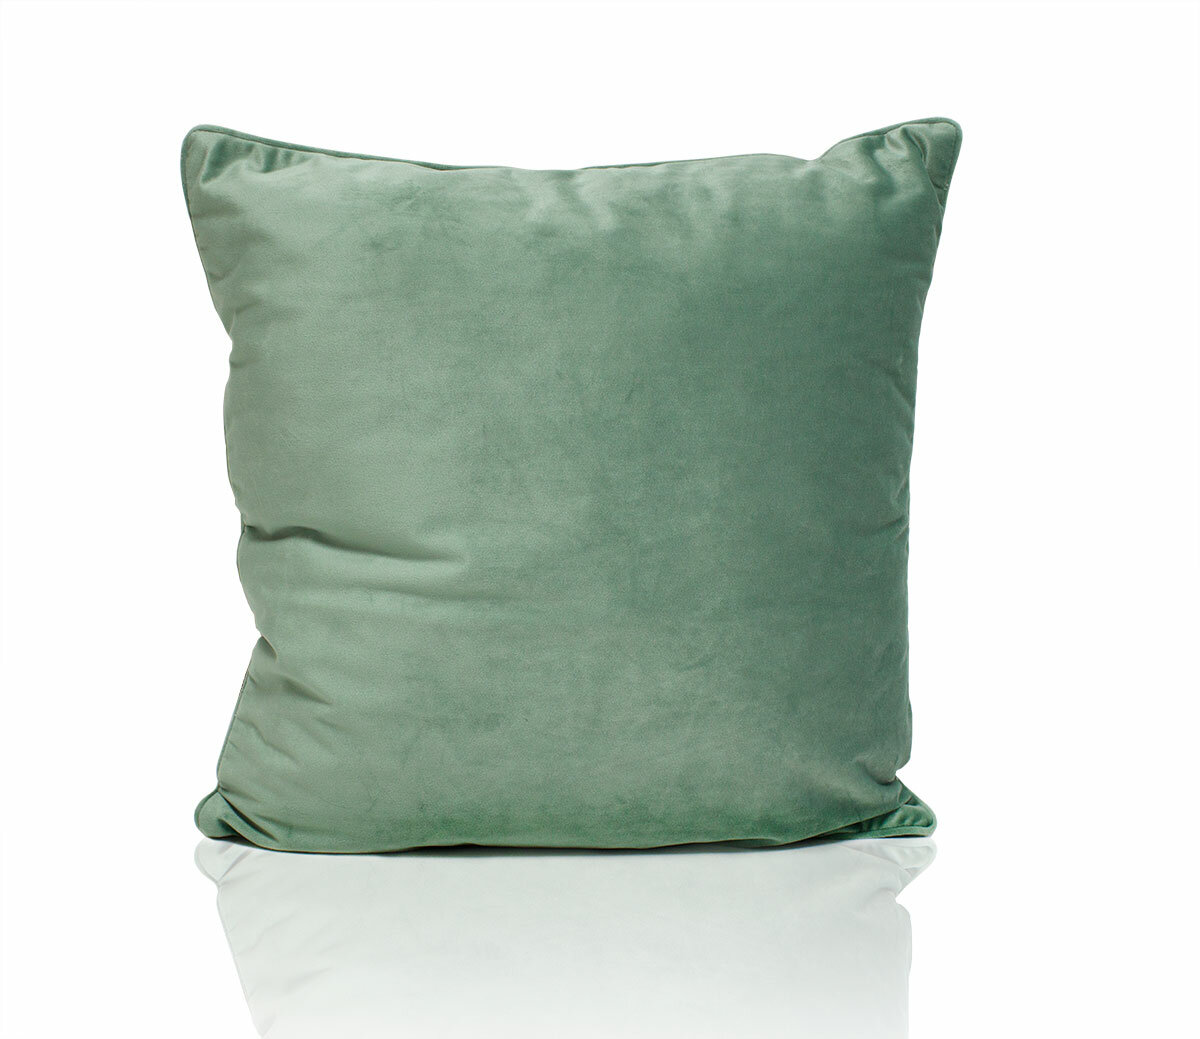 Декоративная подушка Mona зеленый Tivolyo (зеленый), подушка 43x43